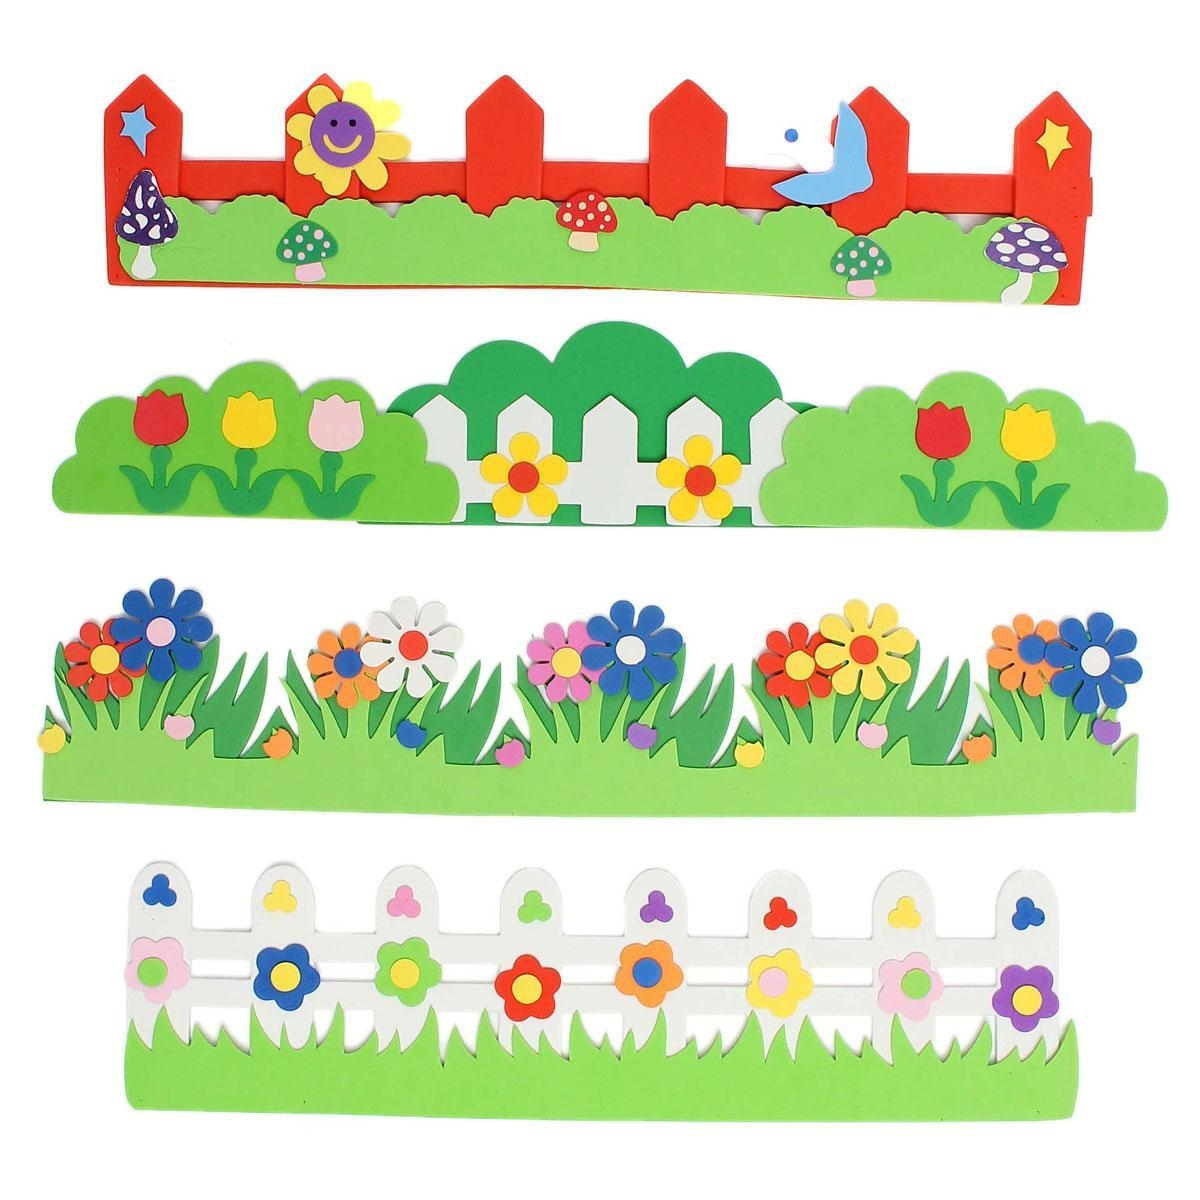 Foam Fence Kindergarten Classroom Playground Decorative Supplies With Regard To Wall Art For Kindergarten Classroom (Image 12 of 20)